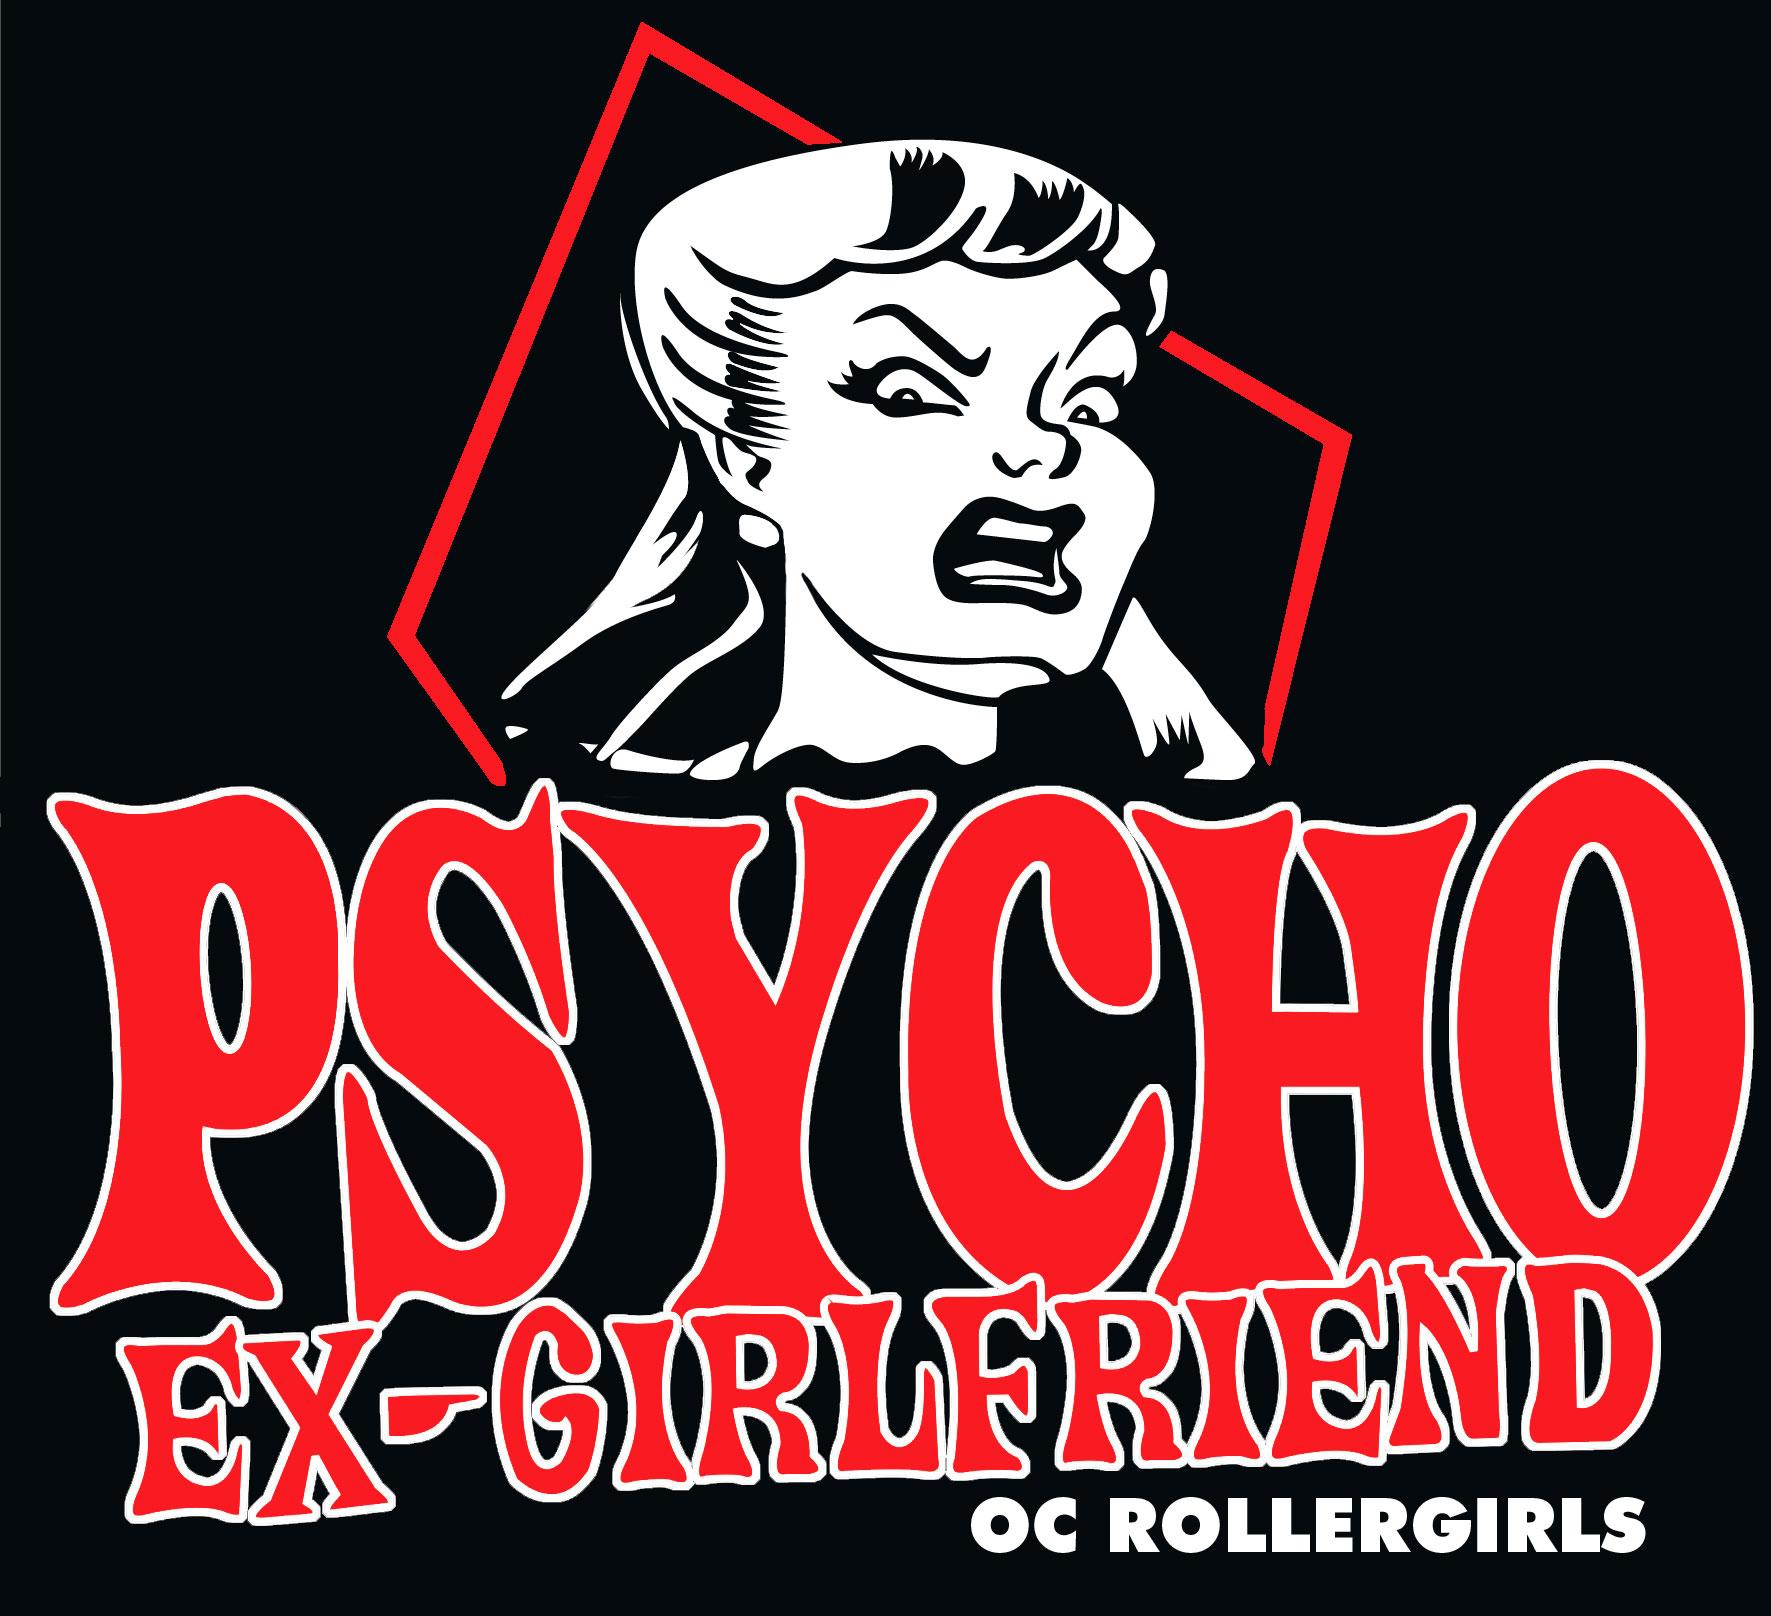 Psycho Ex-Girlfriends